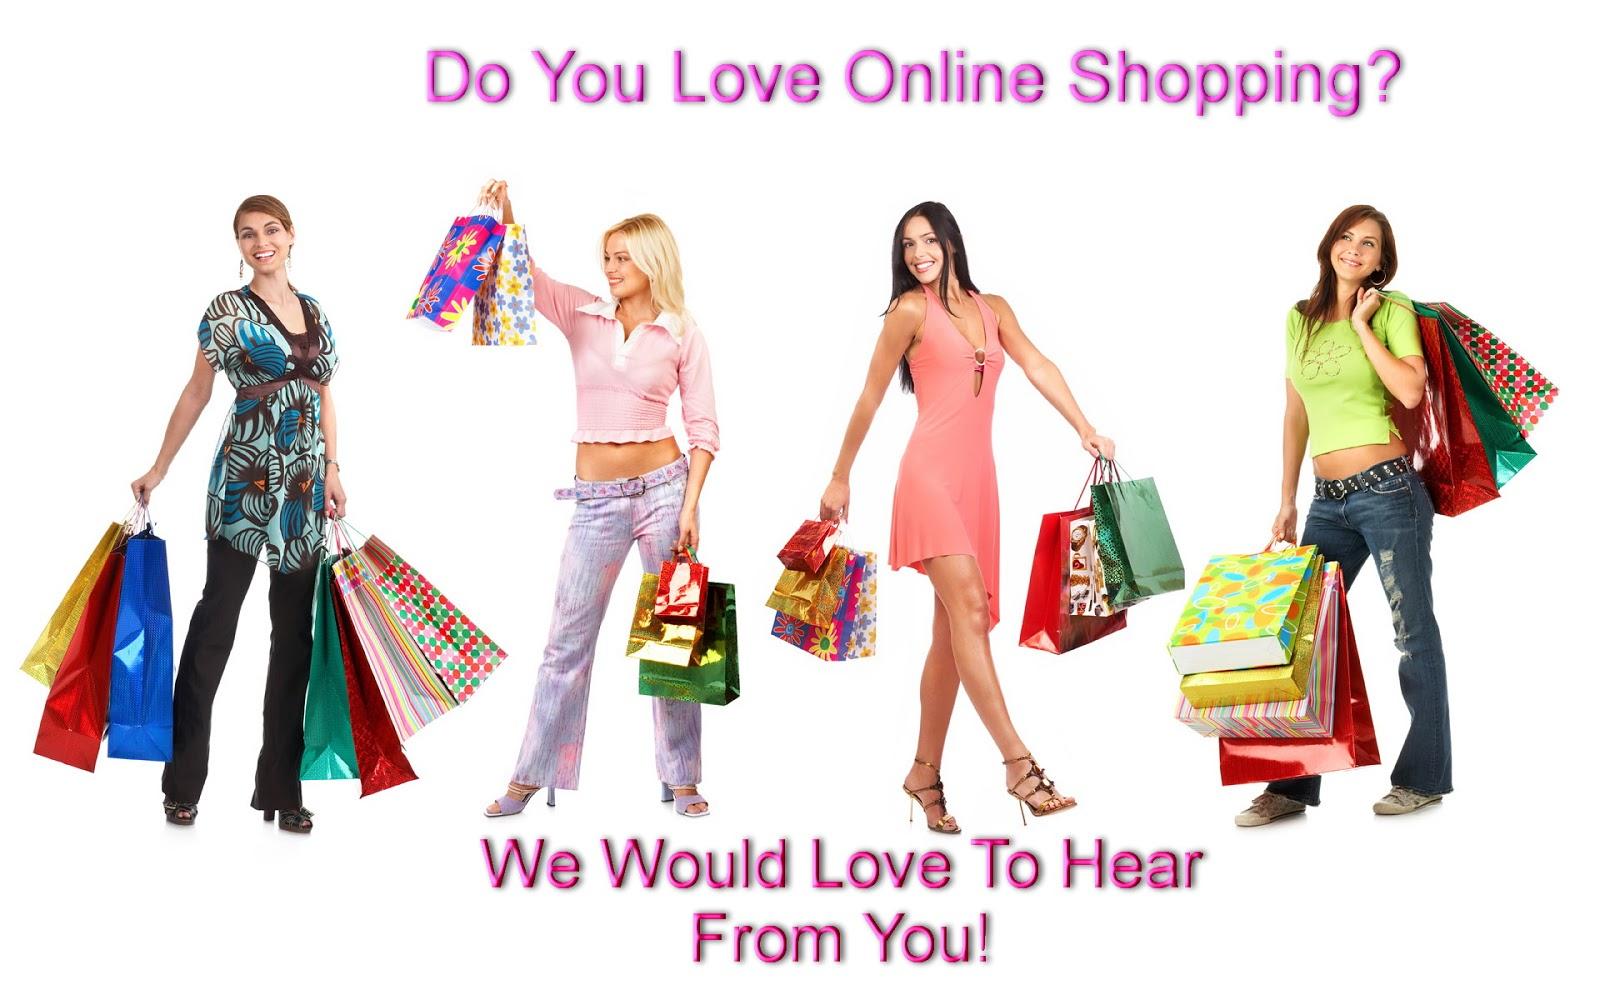 Lovers shop online